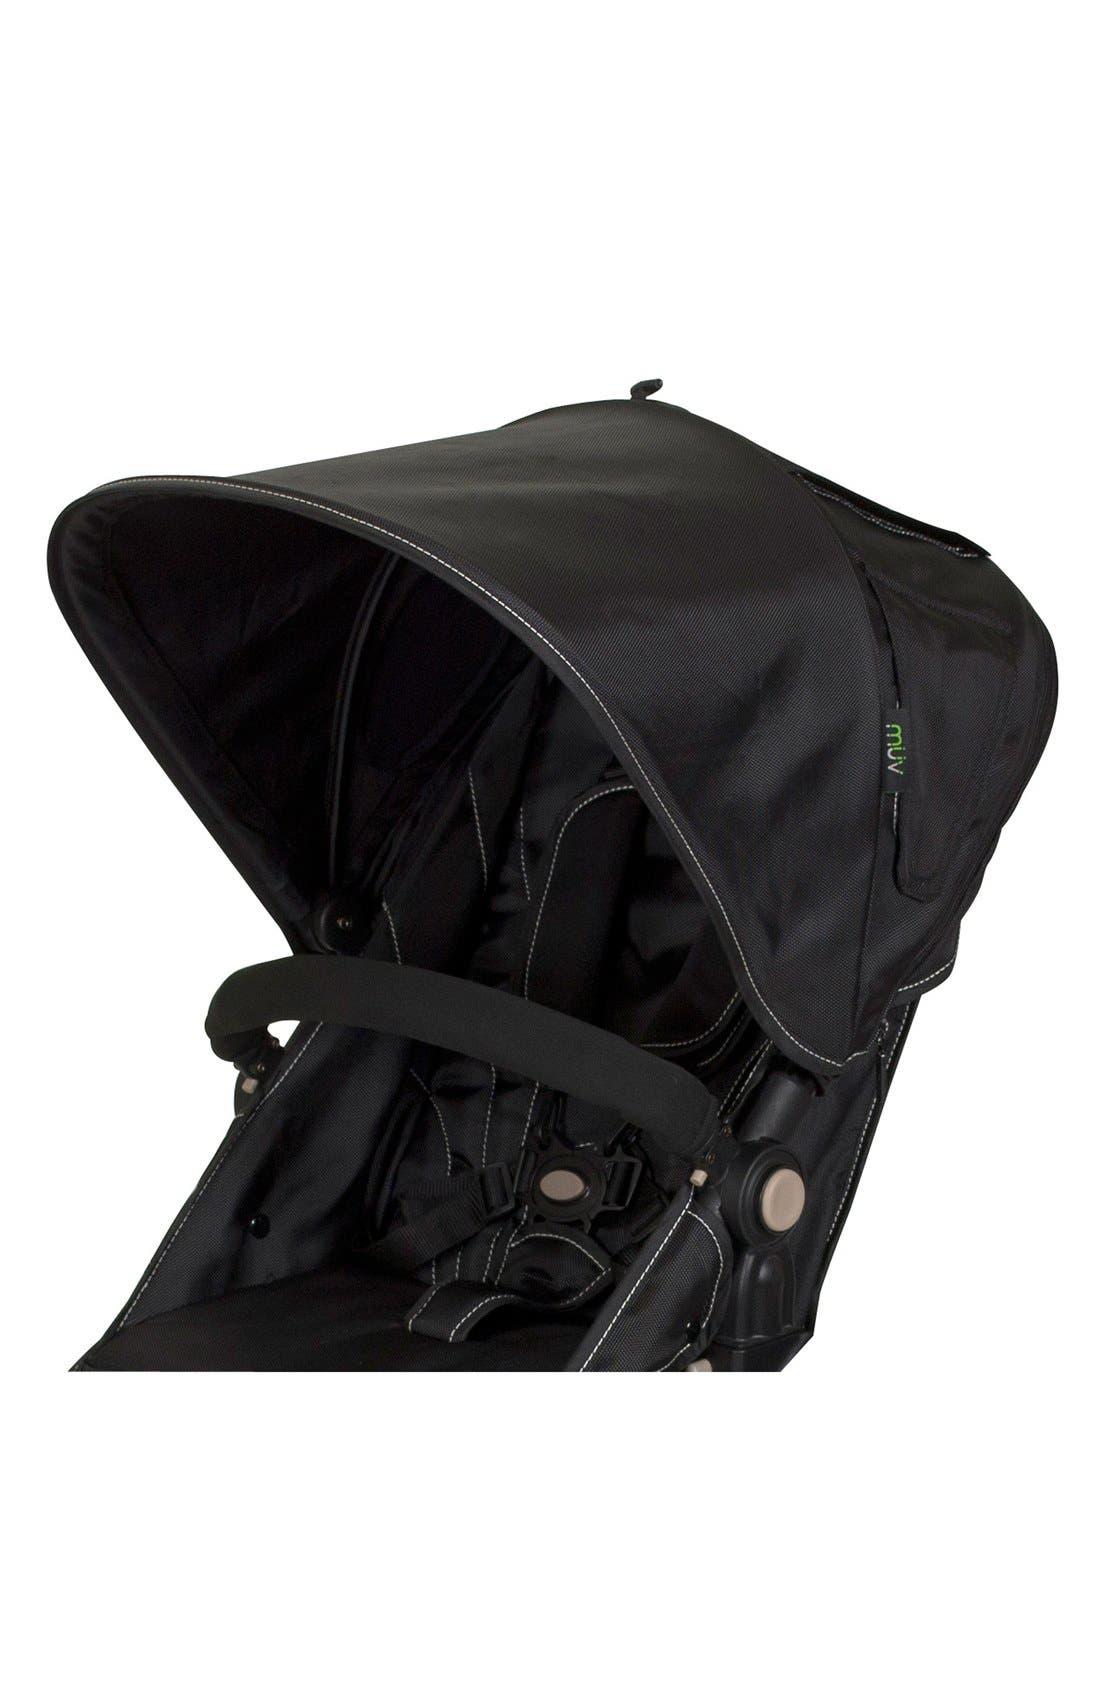 KOEPEL Stroller Canopy,                             Main thumbnail 1, color,                             MYSTIC BLACK